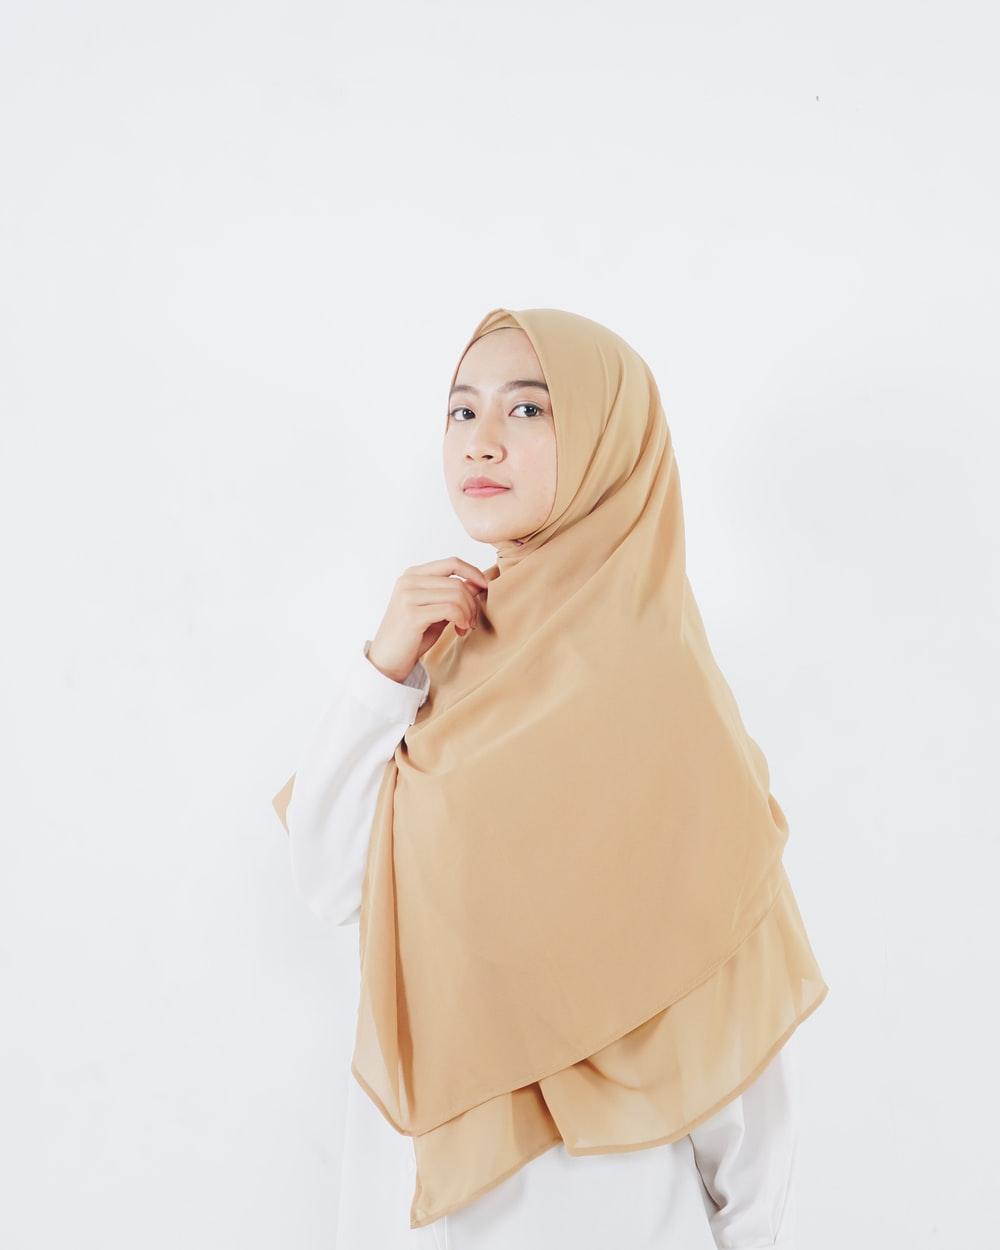 woman in beige hijab standing